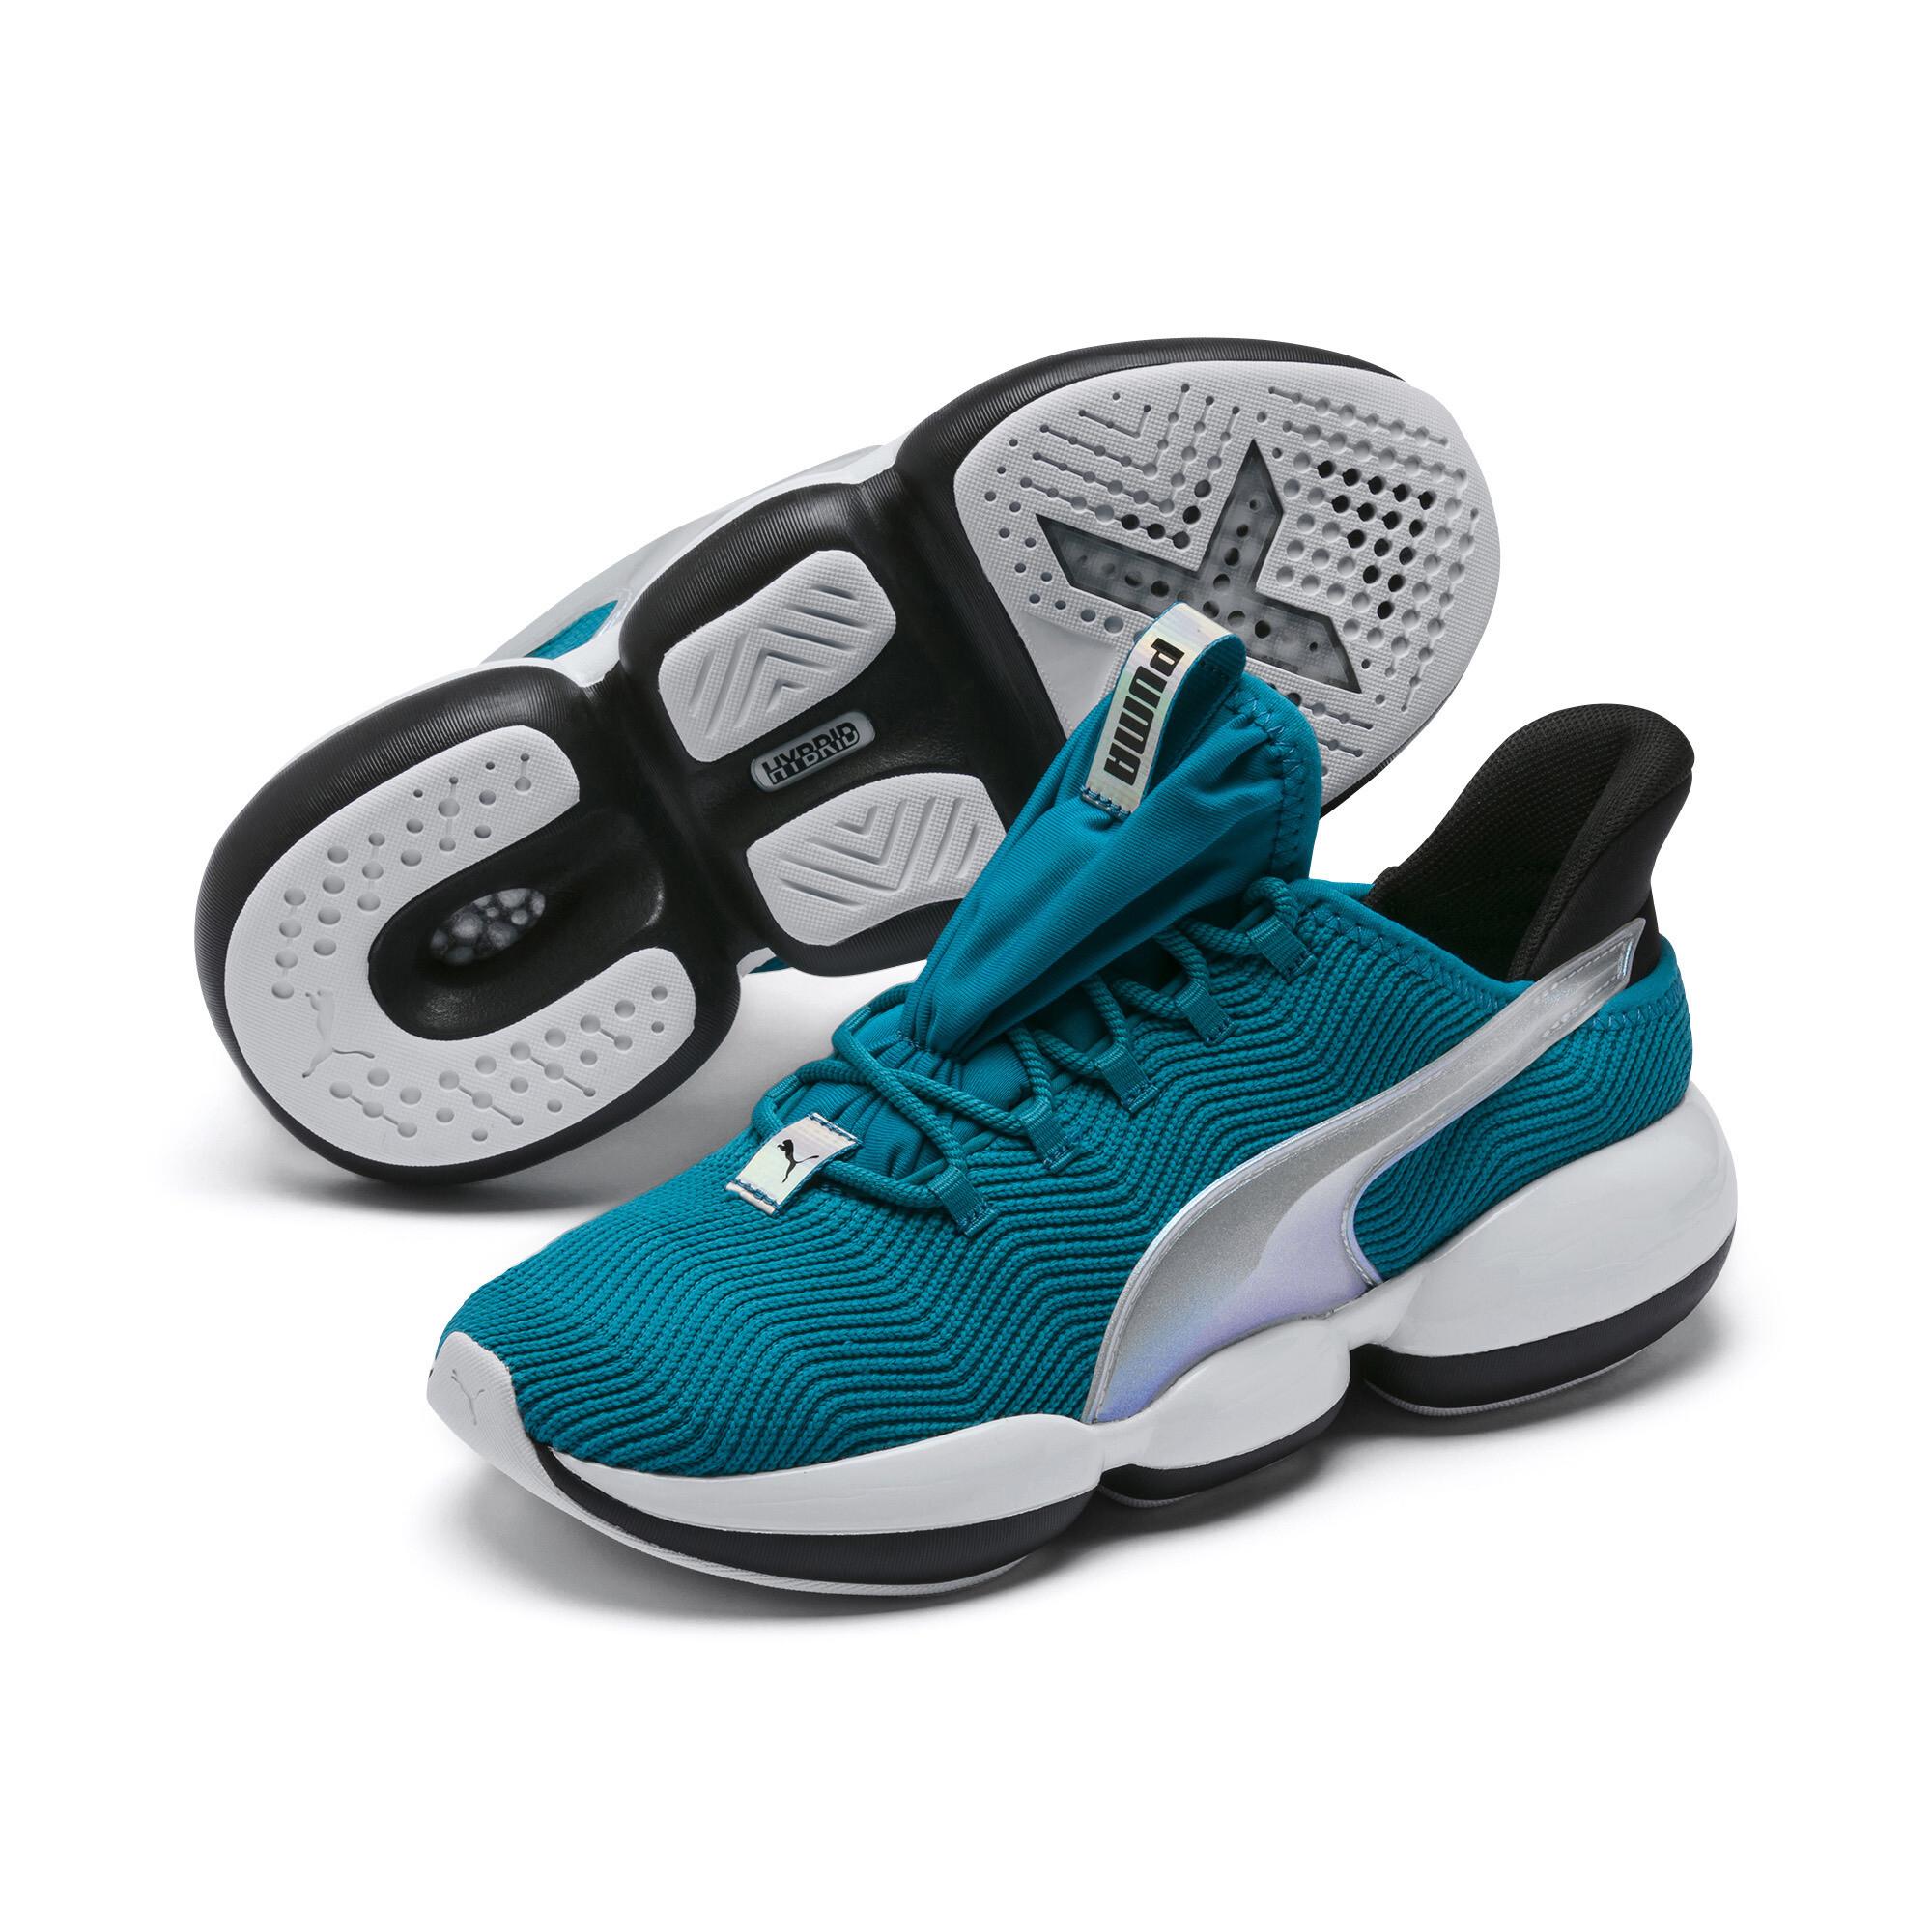 huge discount 5277b e82c2 Image Puma Mode XT Iridescent Trailblazer Women s Sneakers  3